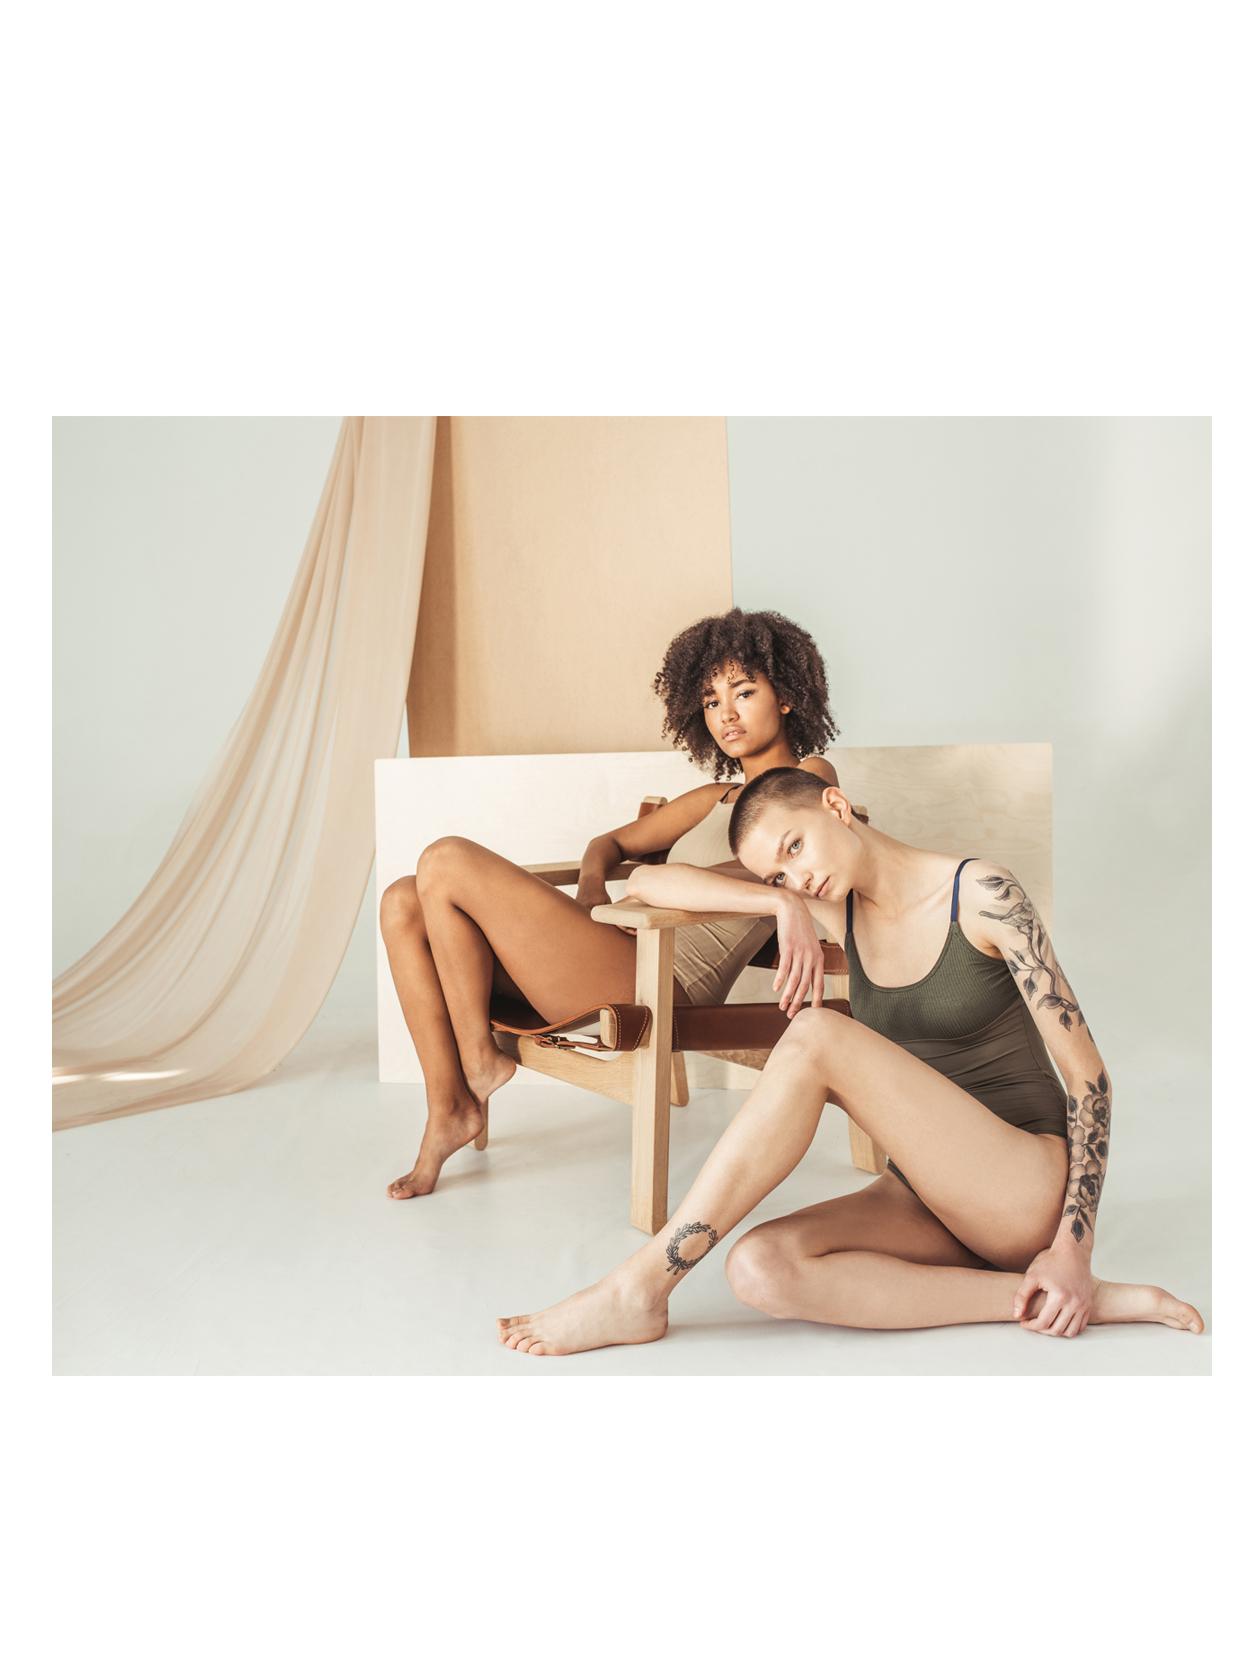 'Terra'  Lingerie Campaign